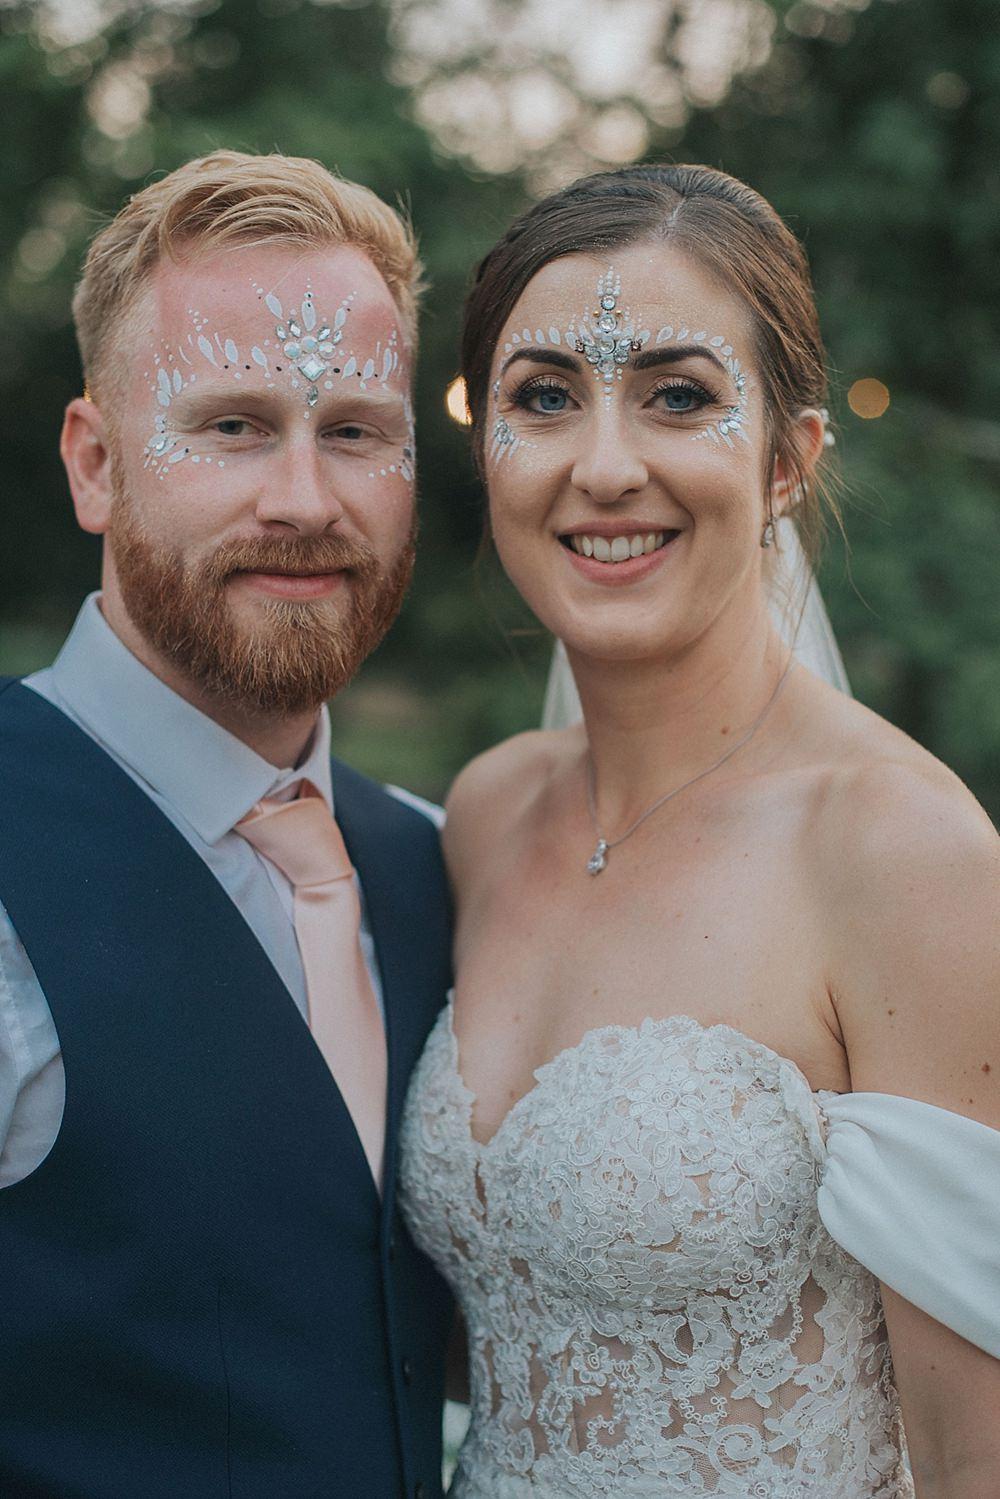 Glitter Make Up Bride Bridal Groom Houchins Farm Wedding Julia and You Photography